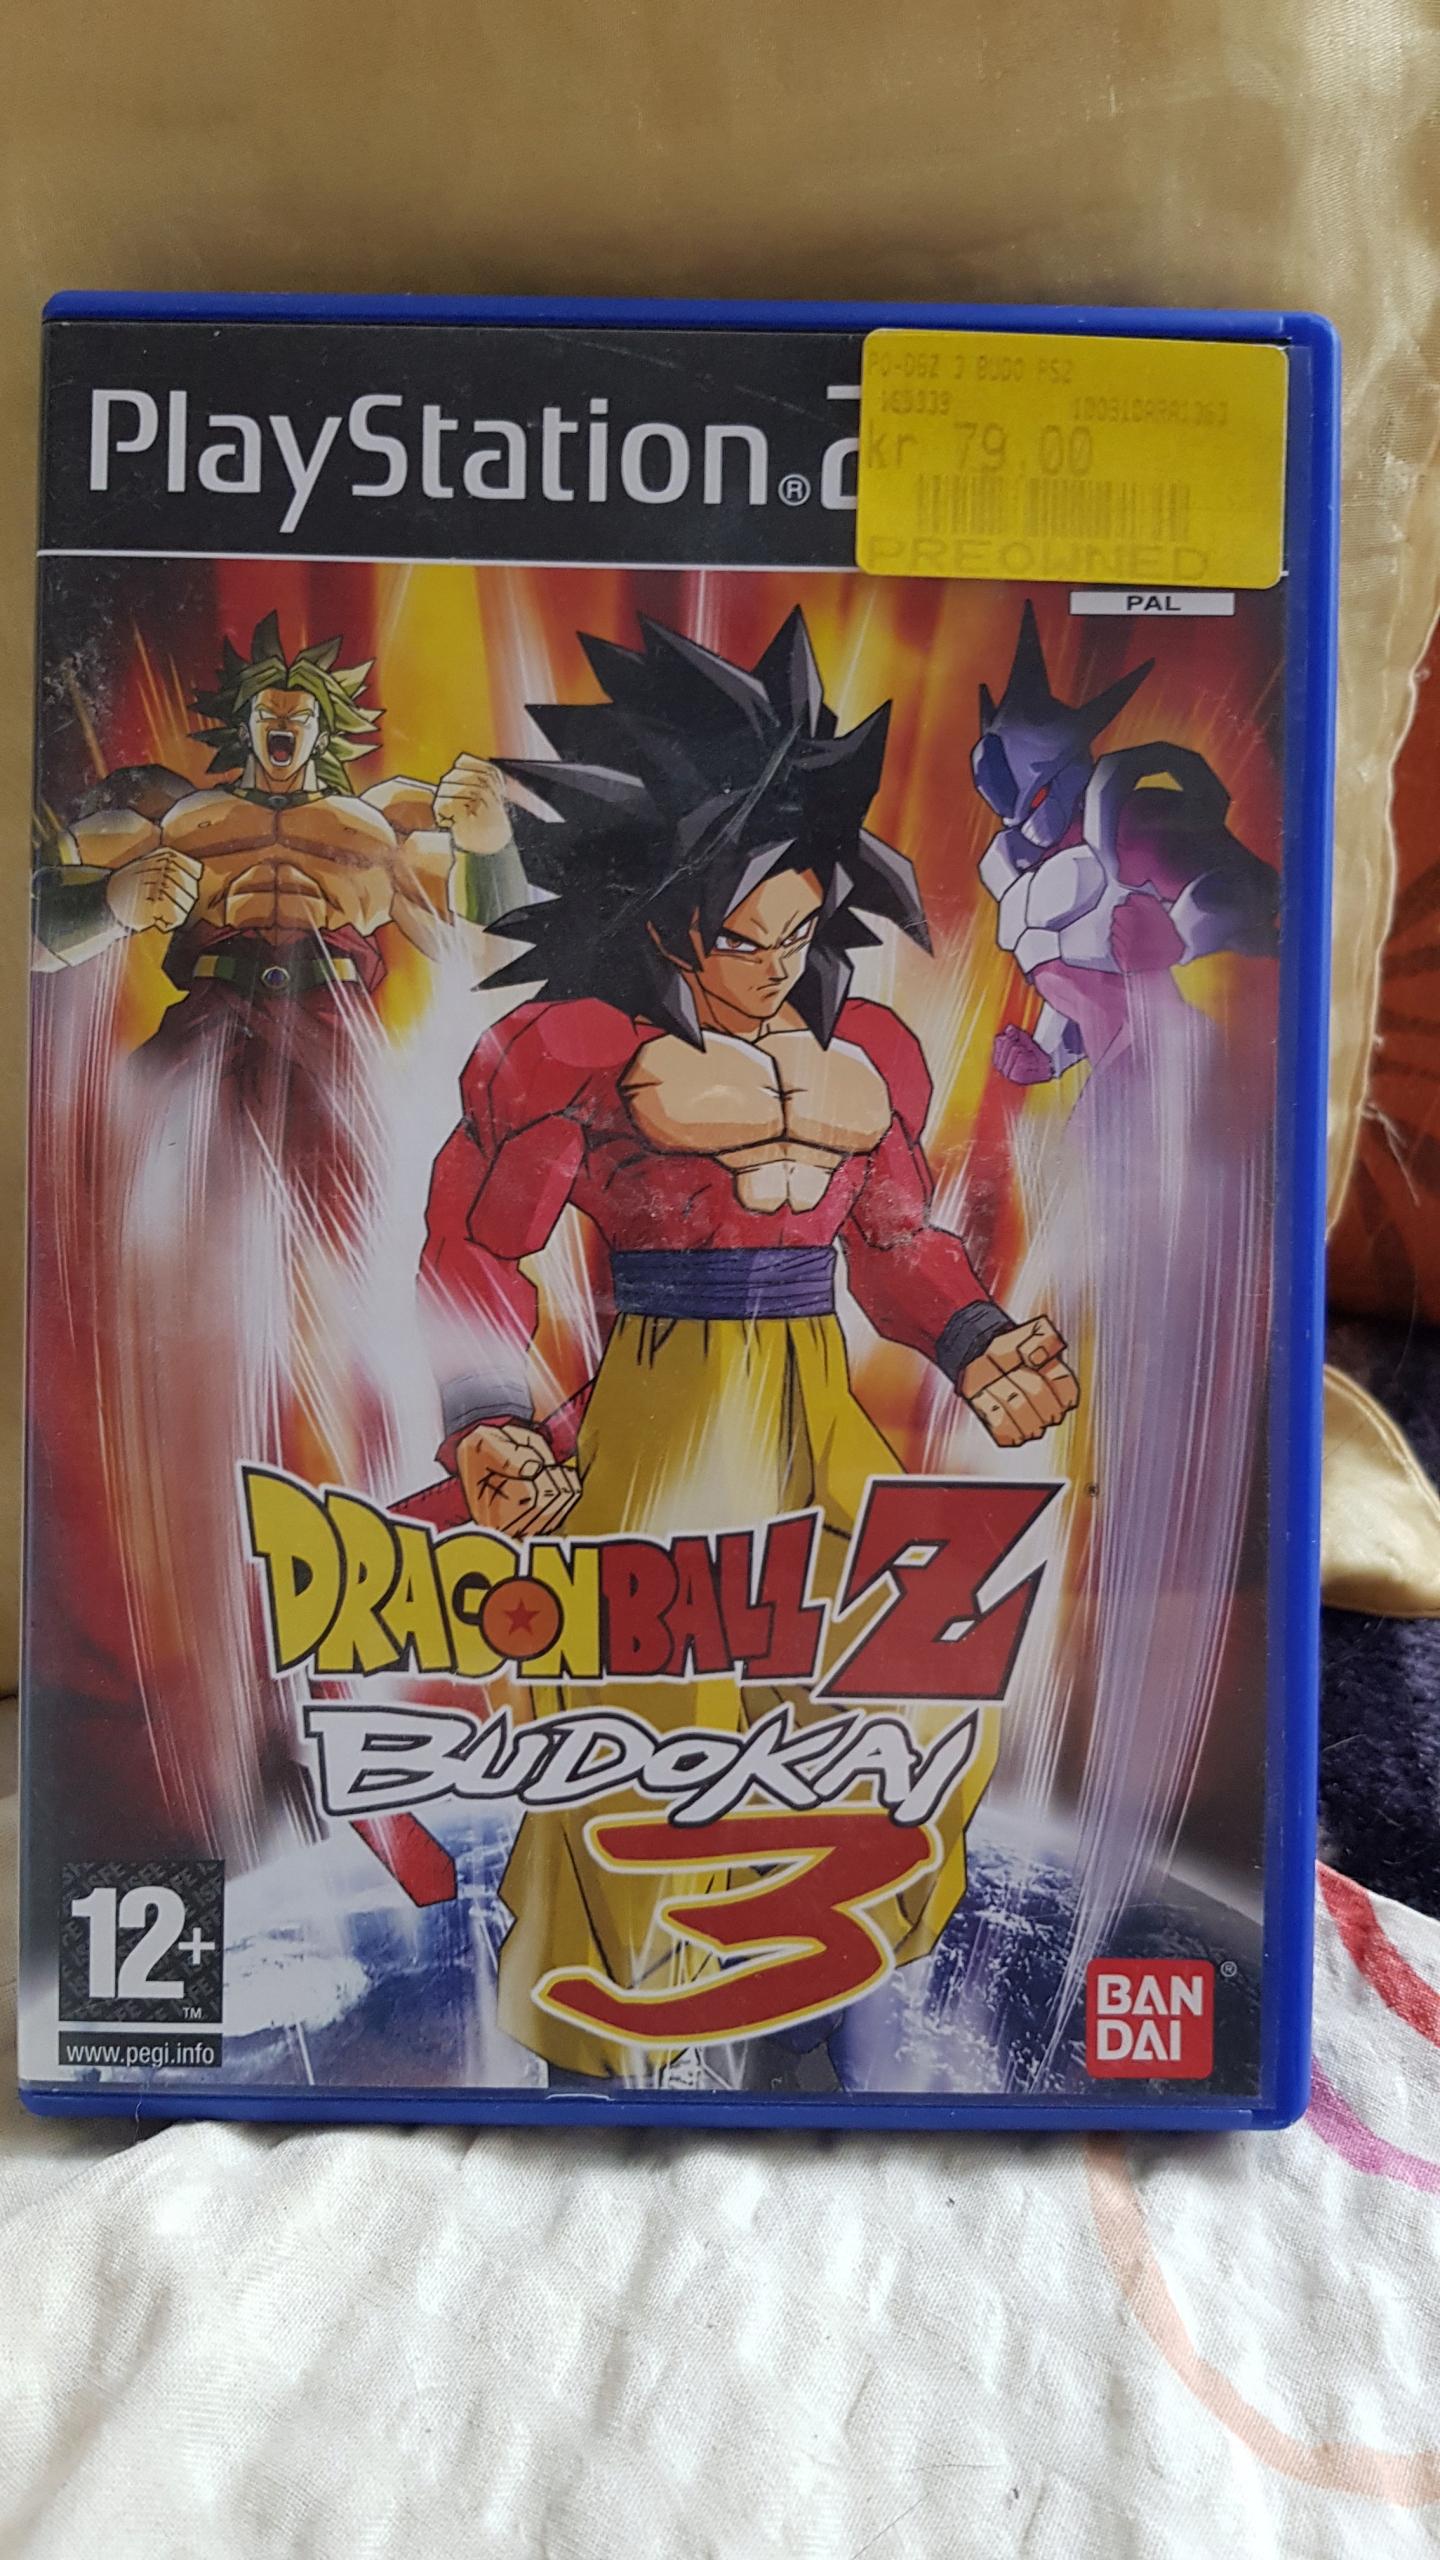 PS2 gra Dragon Ball Z Budokai 3